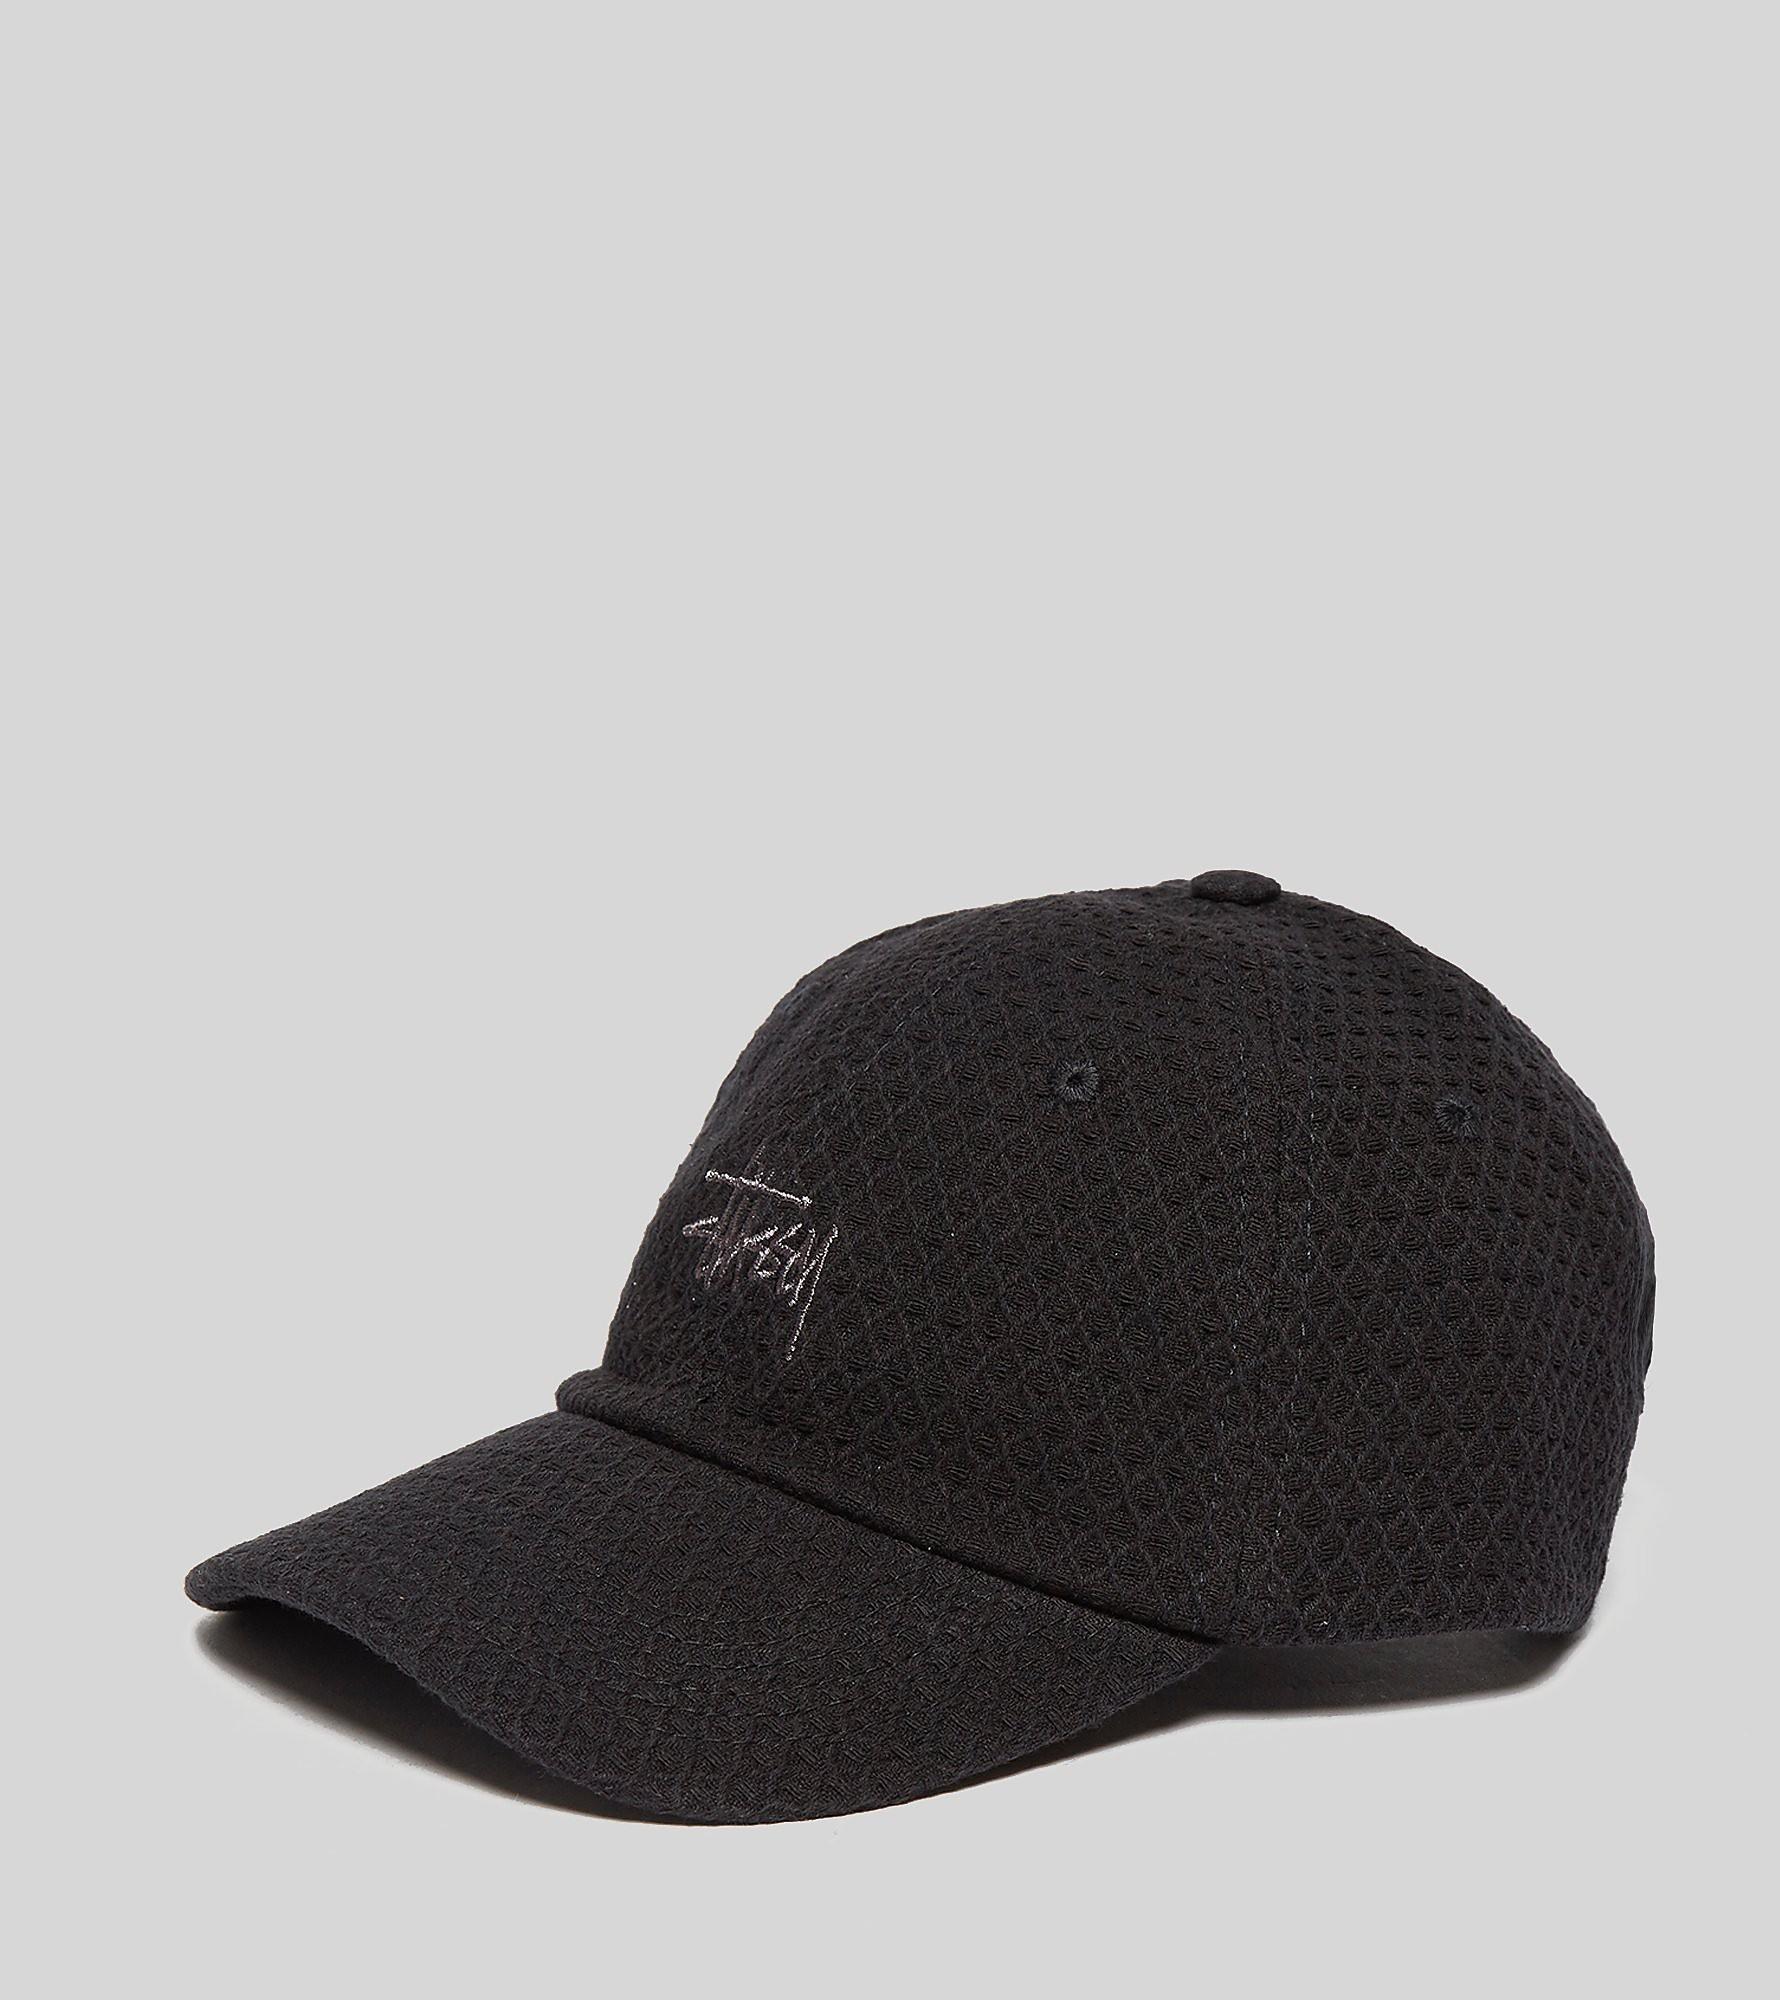 Stussy Knitted Tonal Strapback Cap